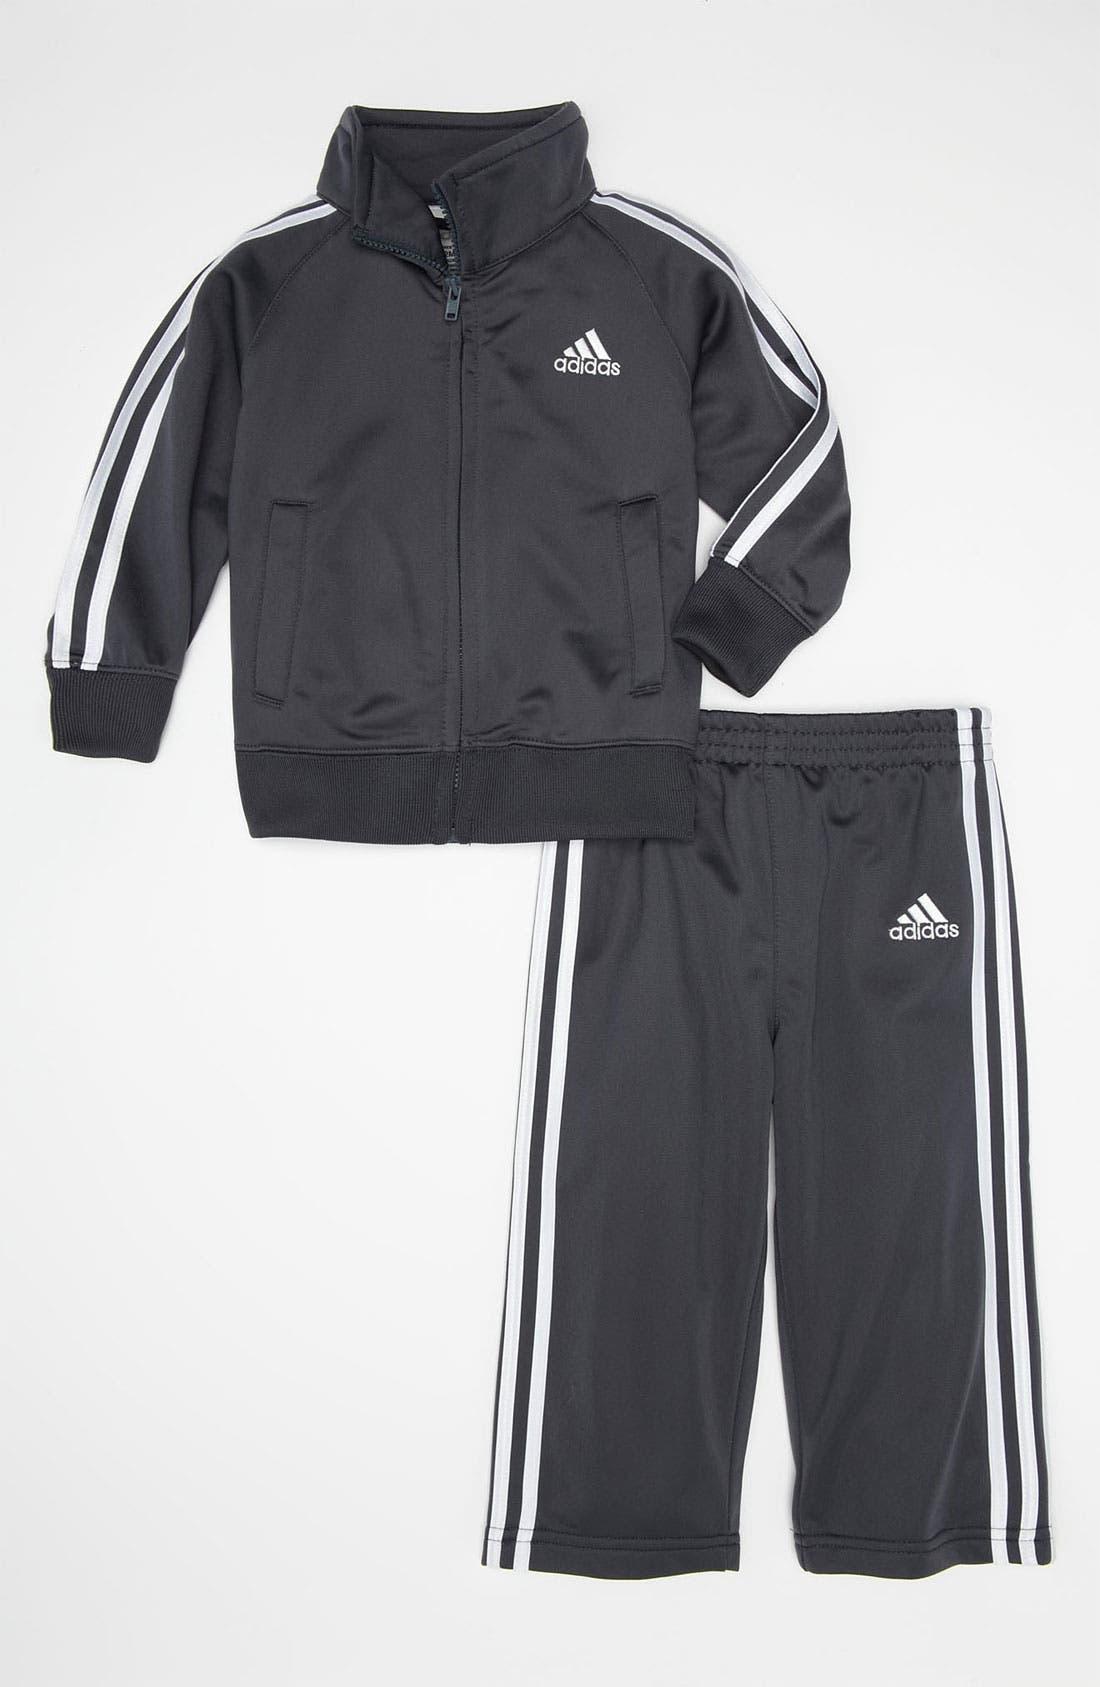 Main Image - adidas Tricot Jacket & Pants Set (Toddler)